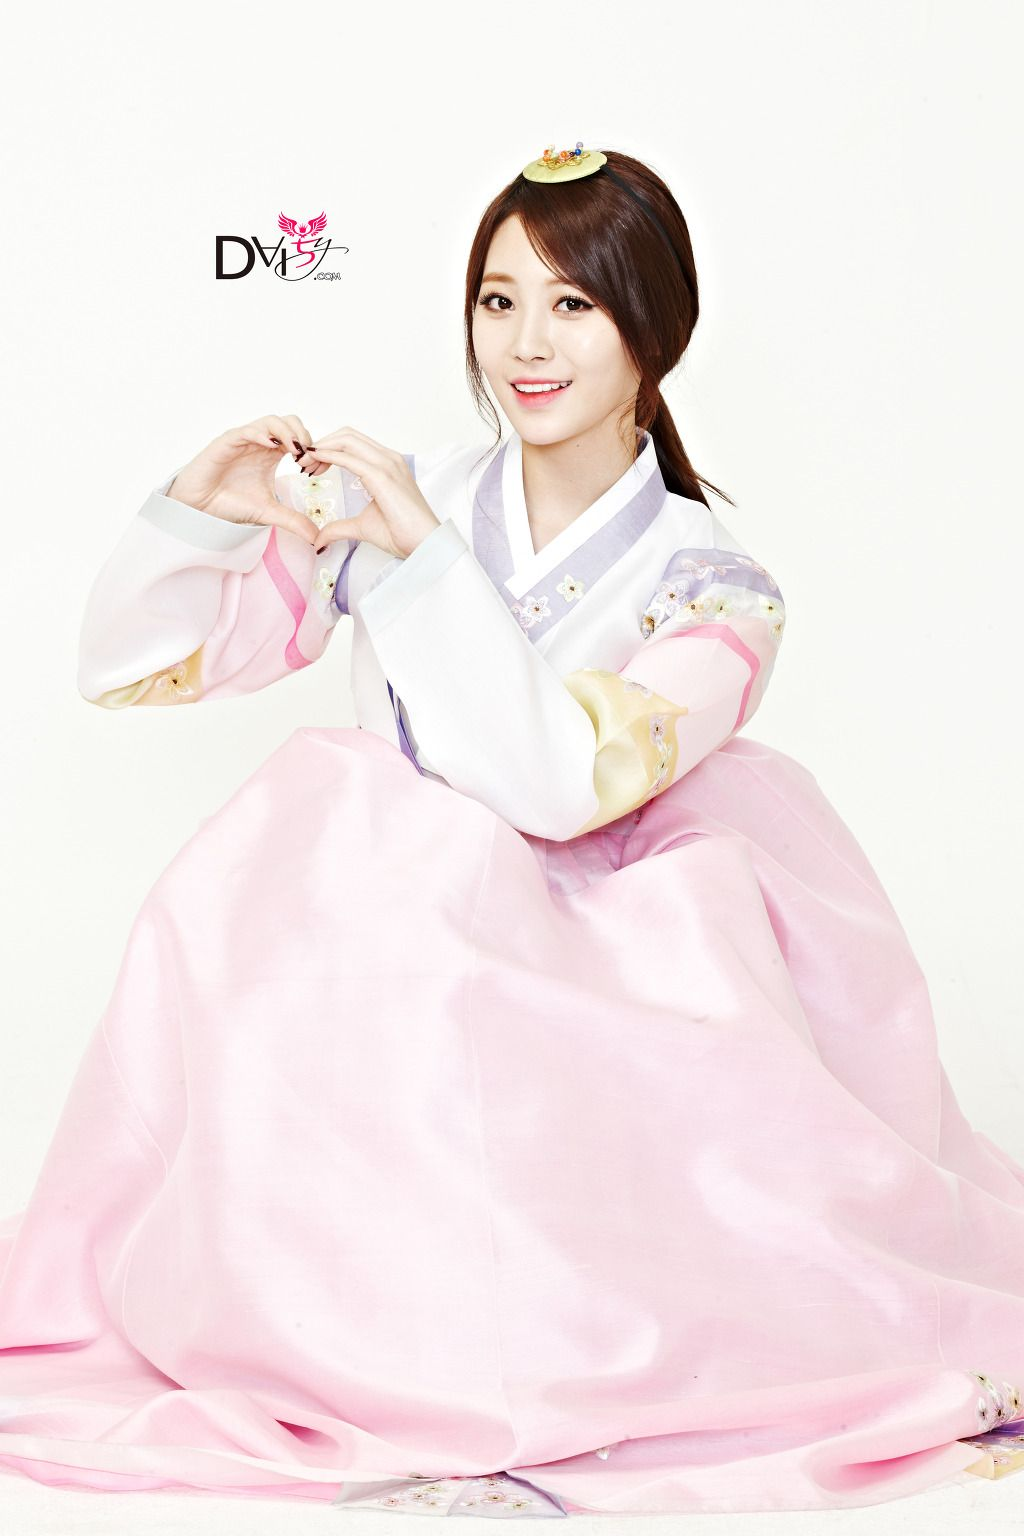 Girls day yura in hanbok lunar new years greeting hanbok kpop girls day yura in hanbok lunar new years greeting kristyandbryce Images